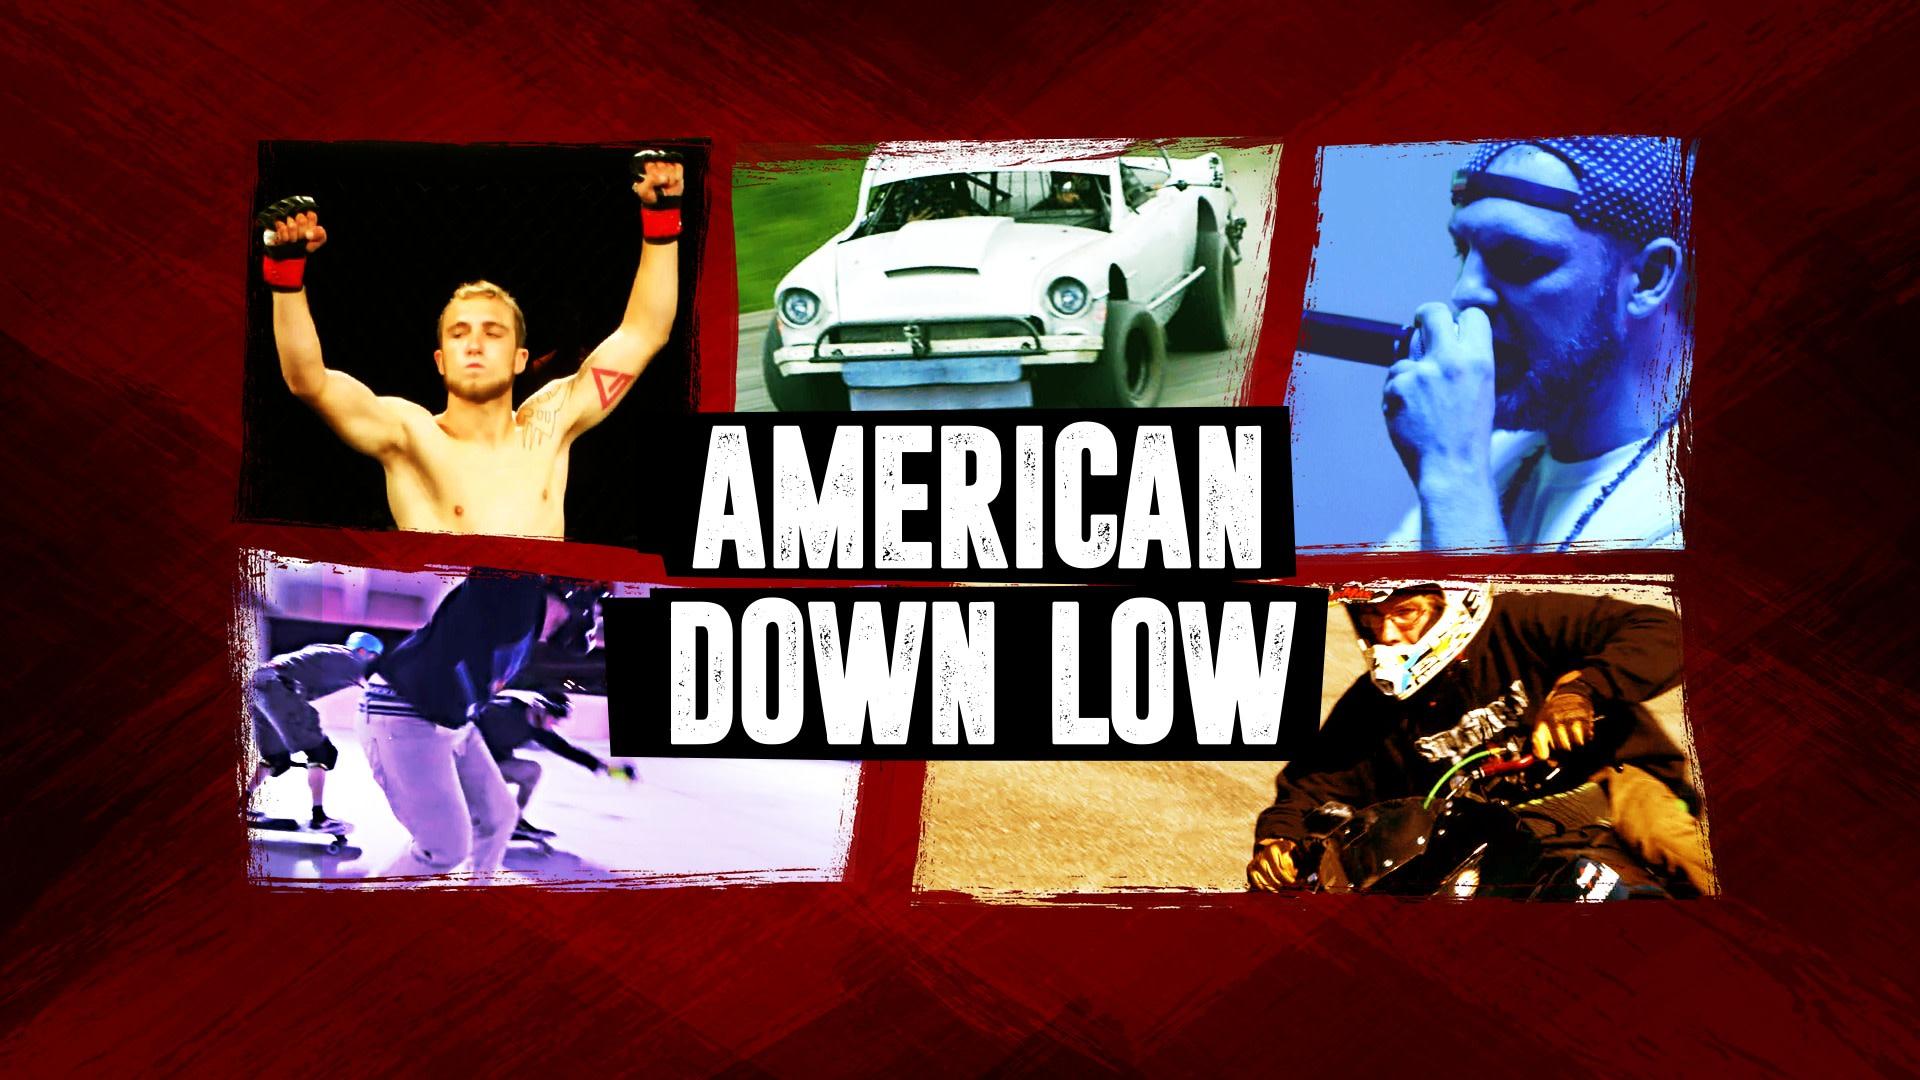 American Down Low